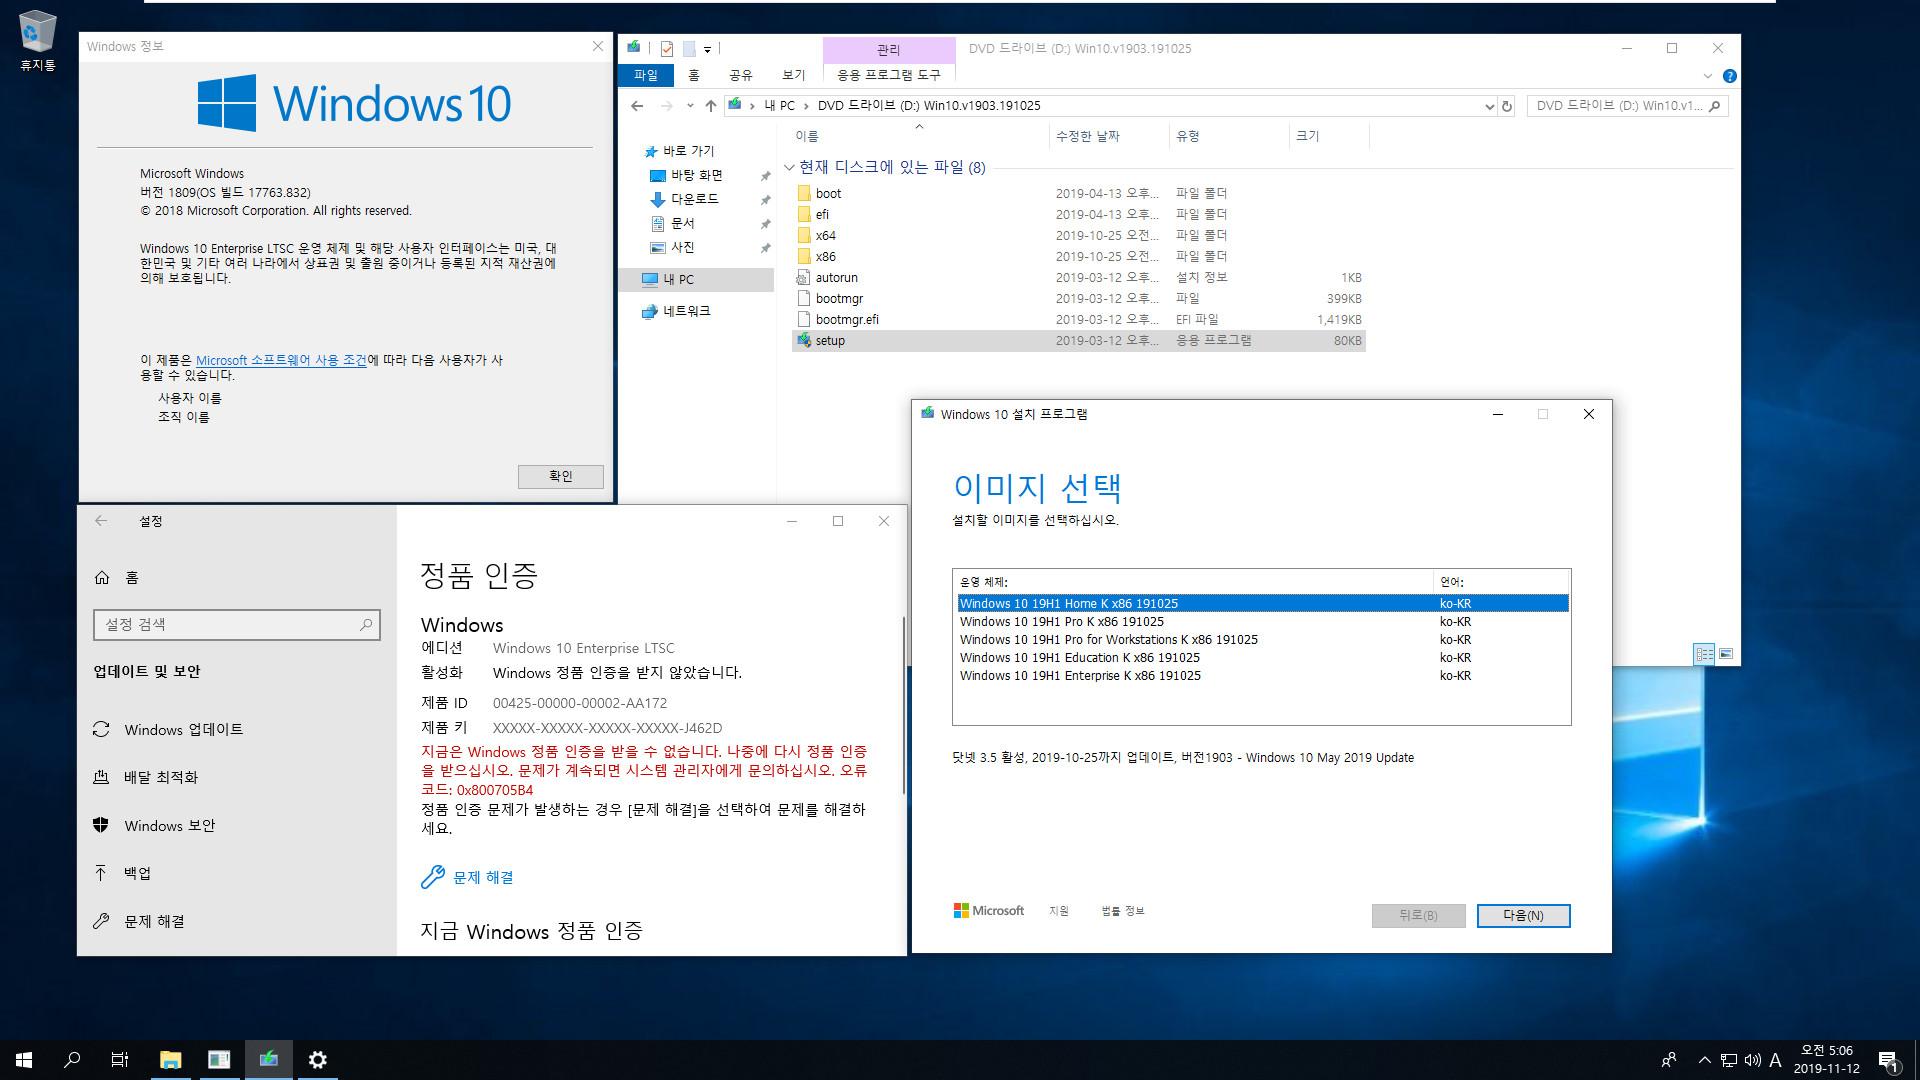 Windows 10 Enterprise LTSC [2019] (버전 1809) 를 버전 1903 프로로 업그레이드 설치하기 - 우선 설정과 앱 유지를 위해서 버전 1903 Enterprise로 업그레이드 한 후에 버전 1903 Pro로 변경하면 됩니다 2019-11-12_050645.jpg